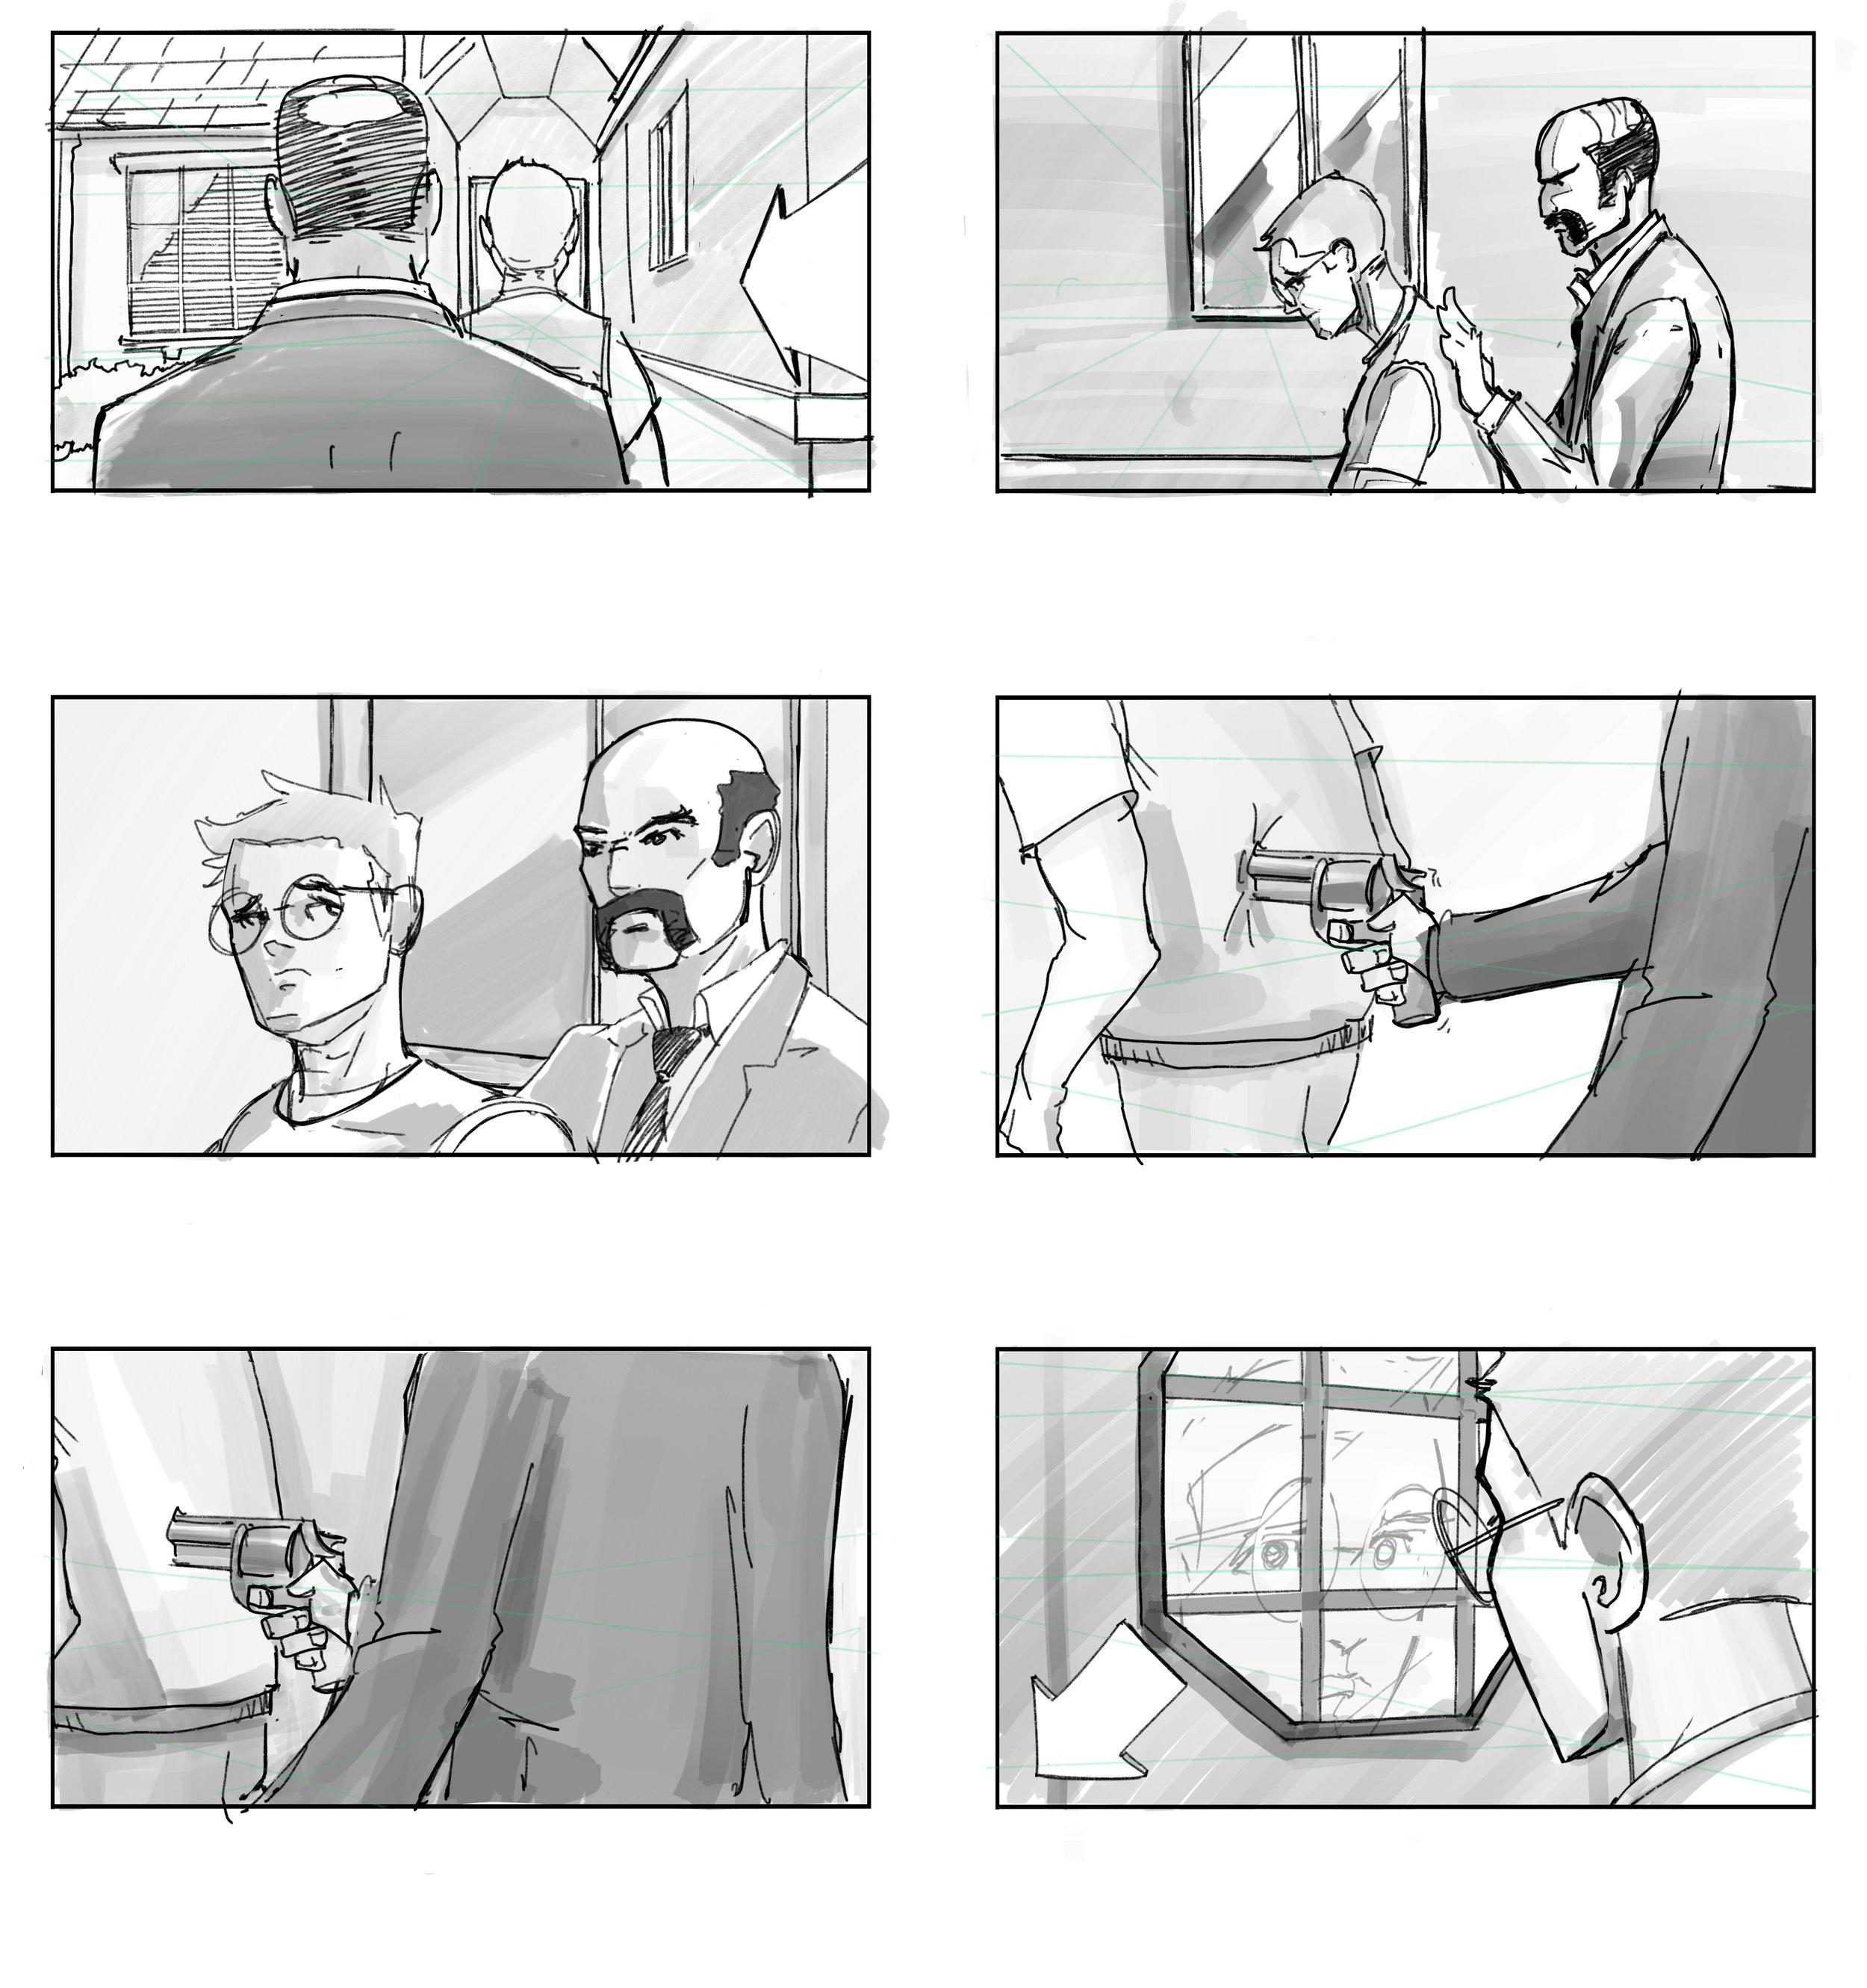 SAM_BS_Catapano_Storyboards_001.jpg